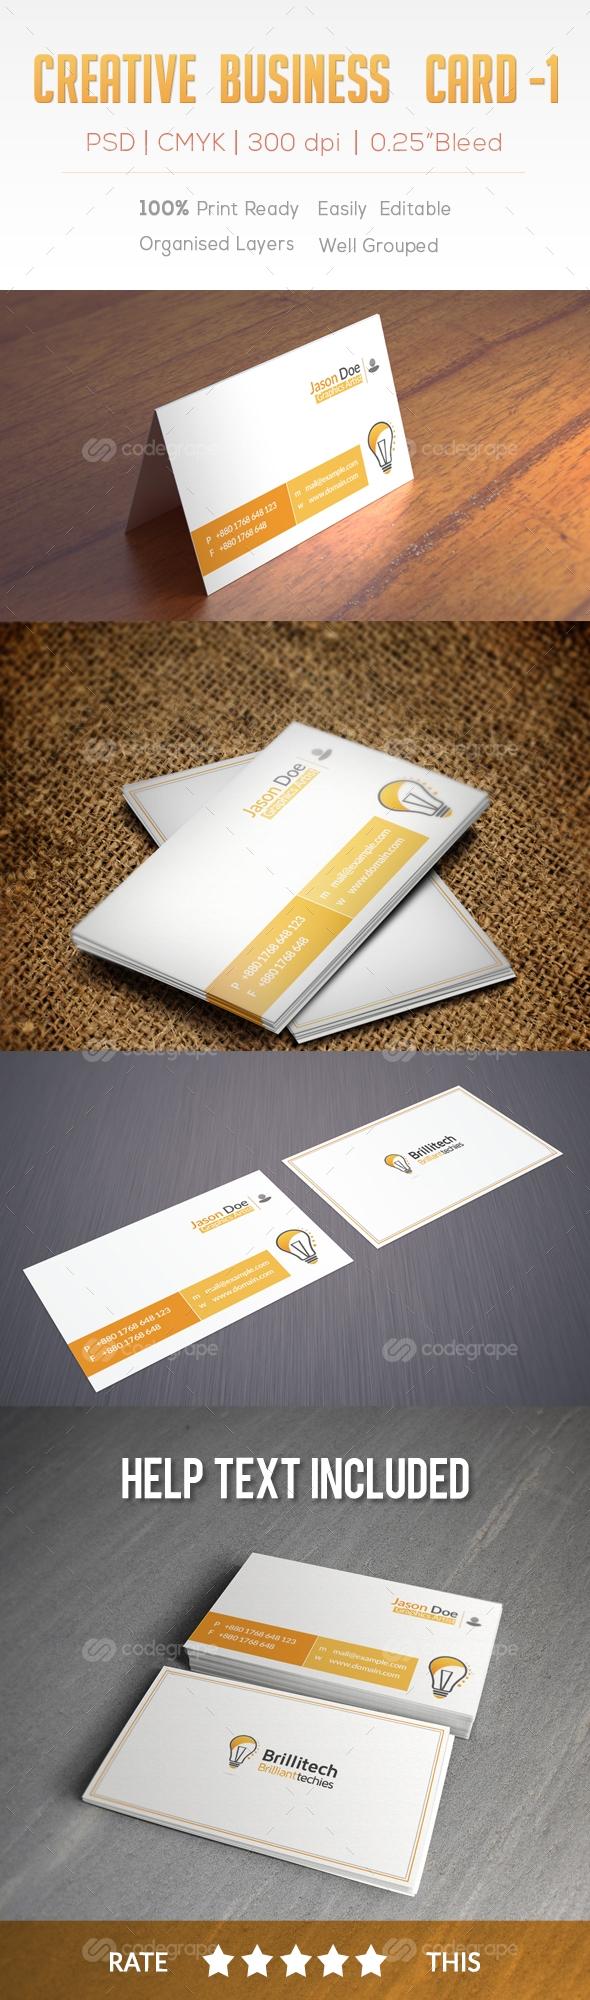 Creative Business card-1